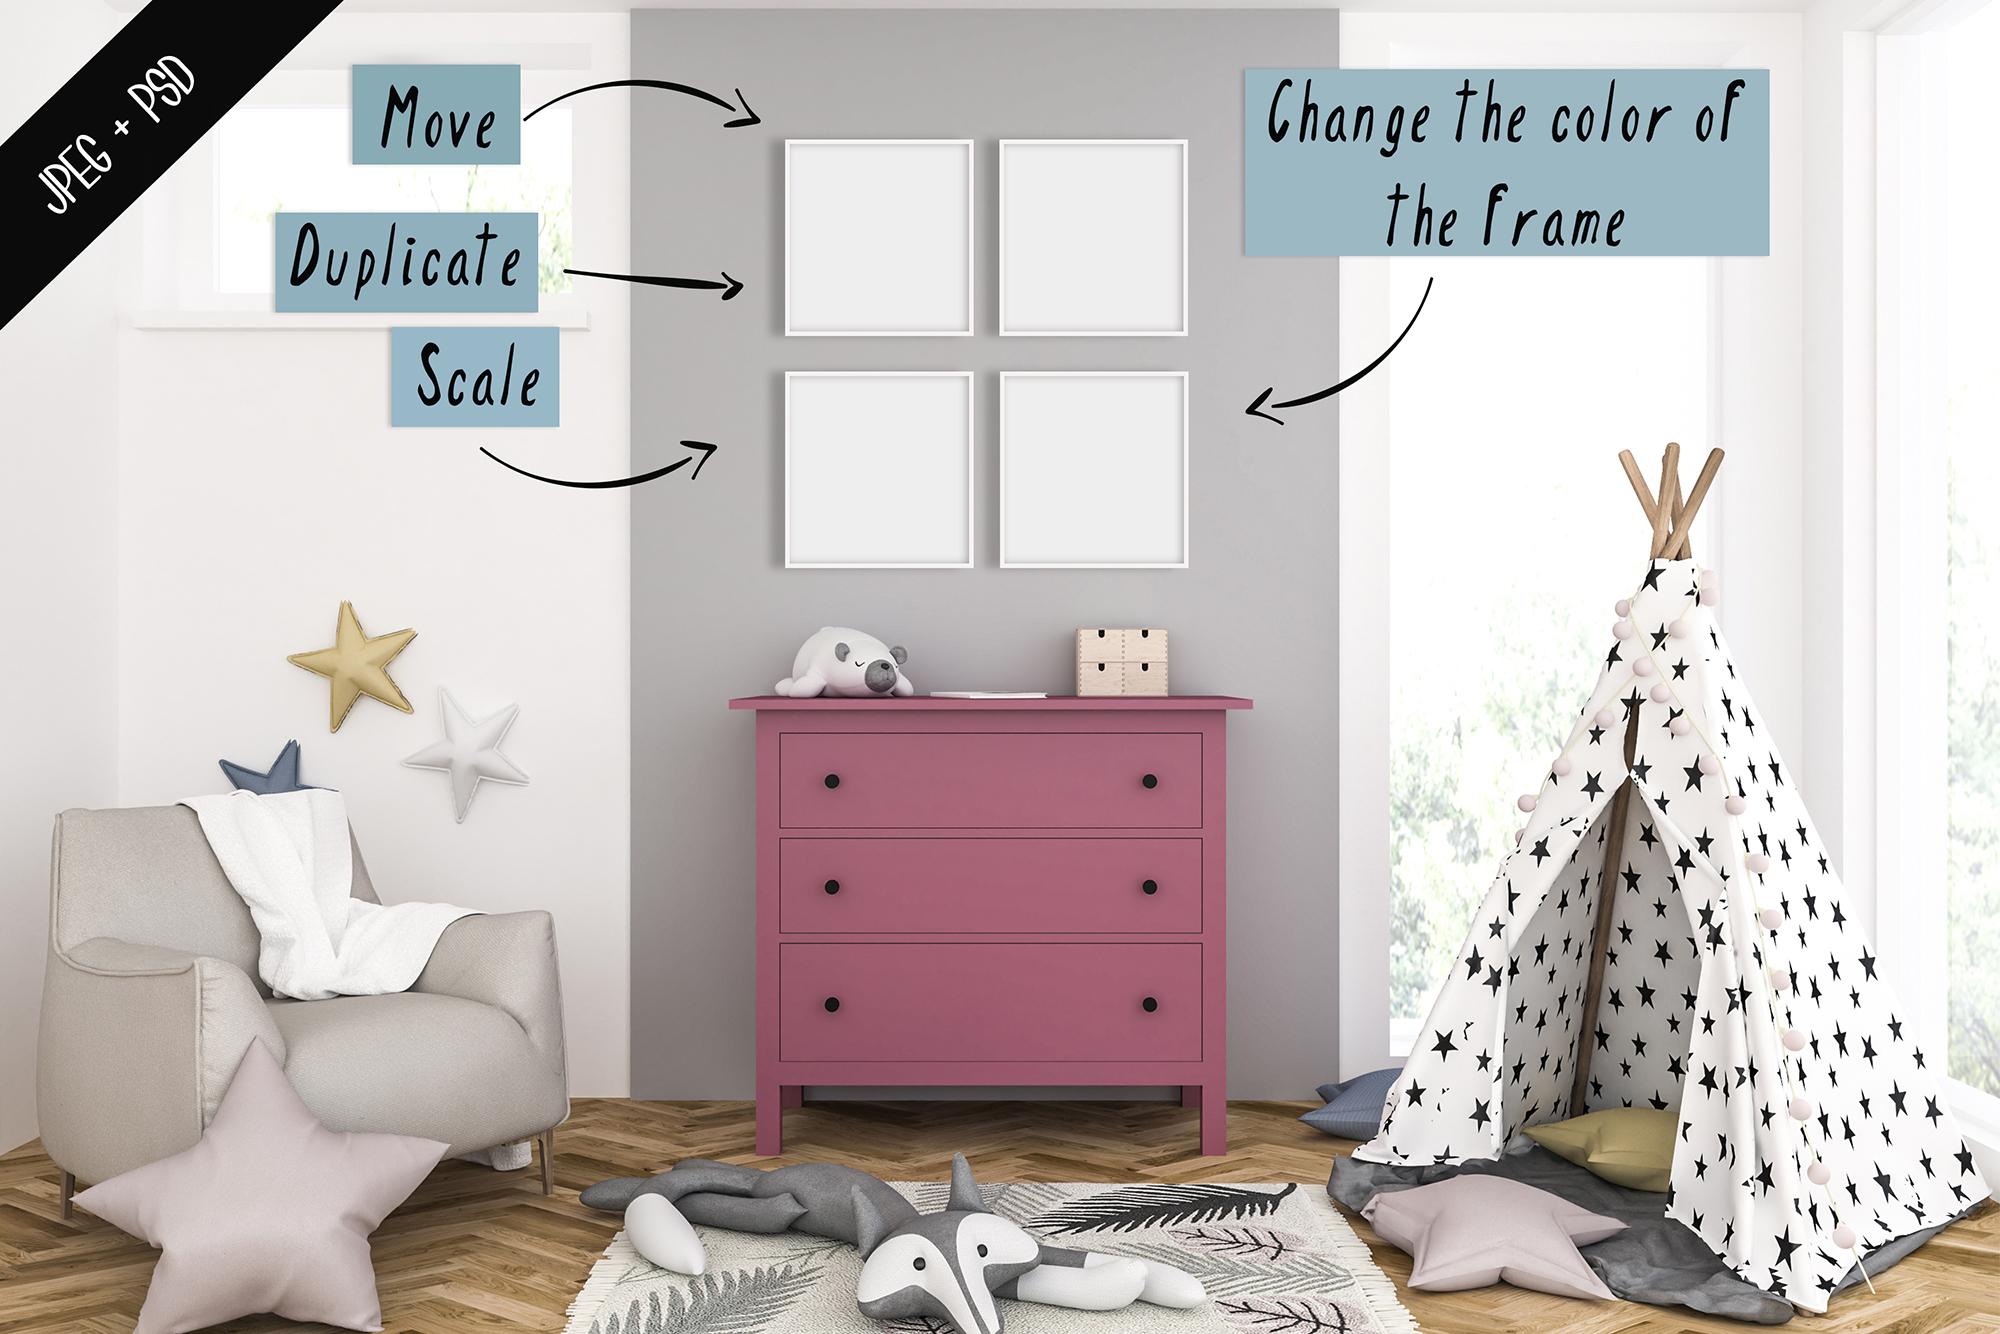 Frame mockup creator - All image size - Interior mockup example image 3